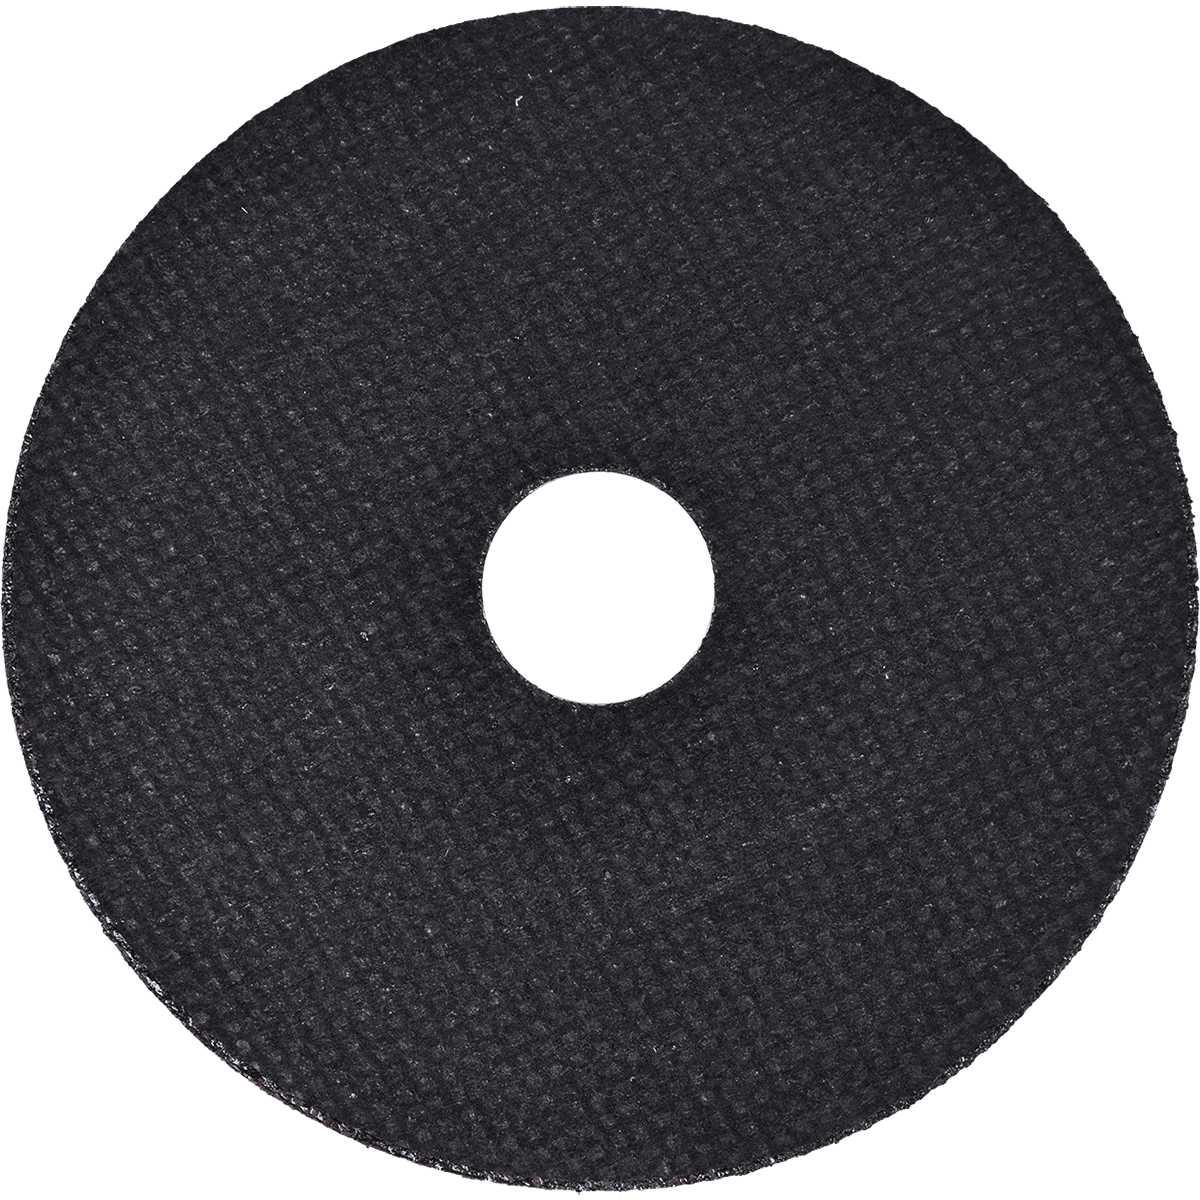 "Disco de Corte Fino Inox 4.1/2"" 1 MM X 7/8"" Bumafer 50 Peças"